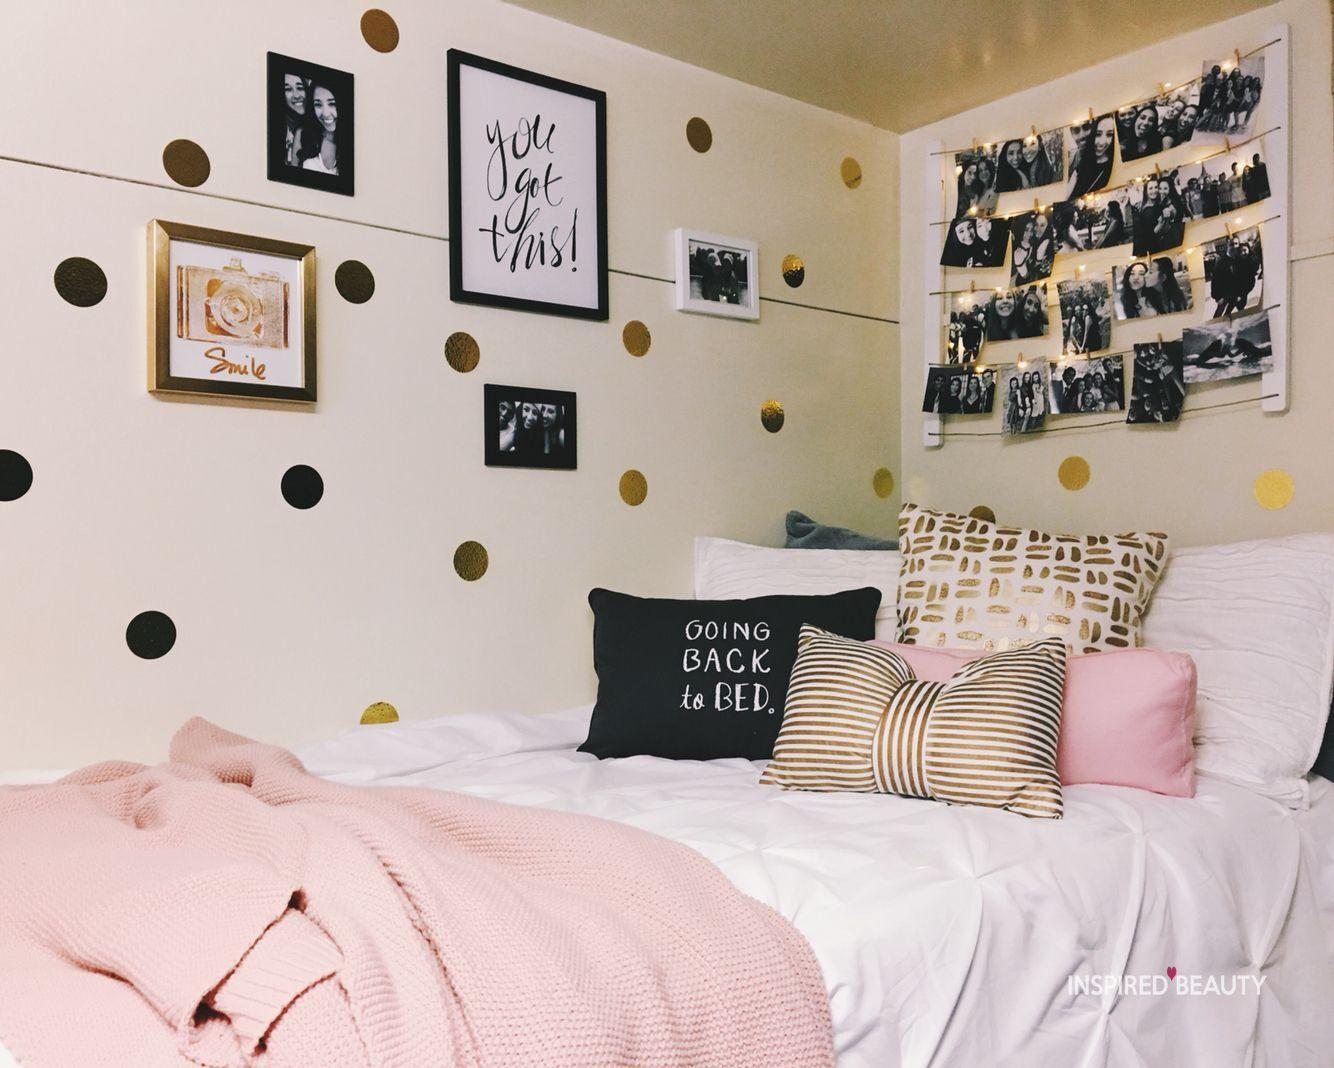 22 Best College Dorm Room Ideas For Girl - Inspired Beauty